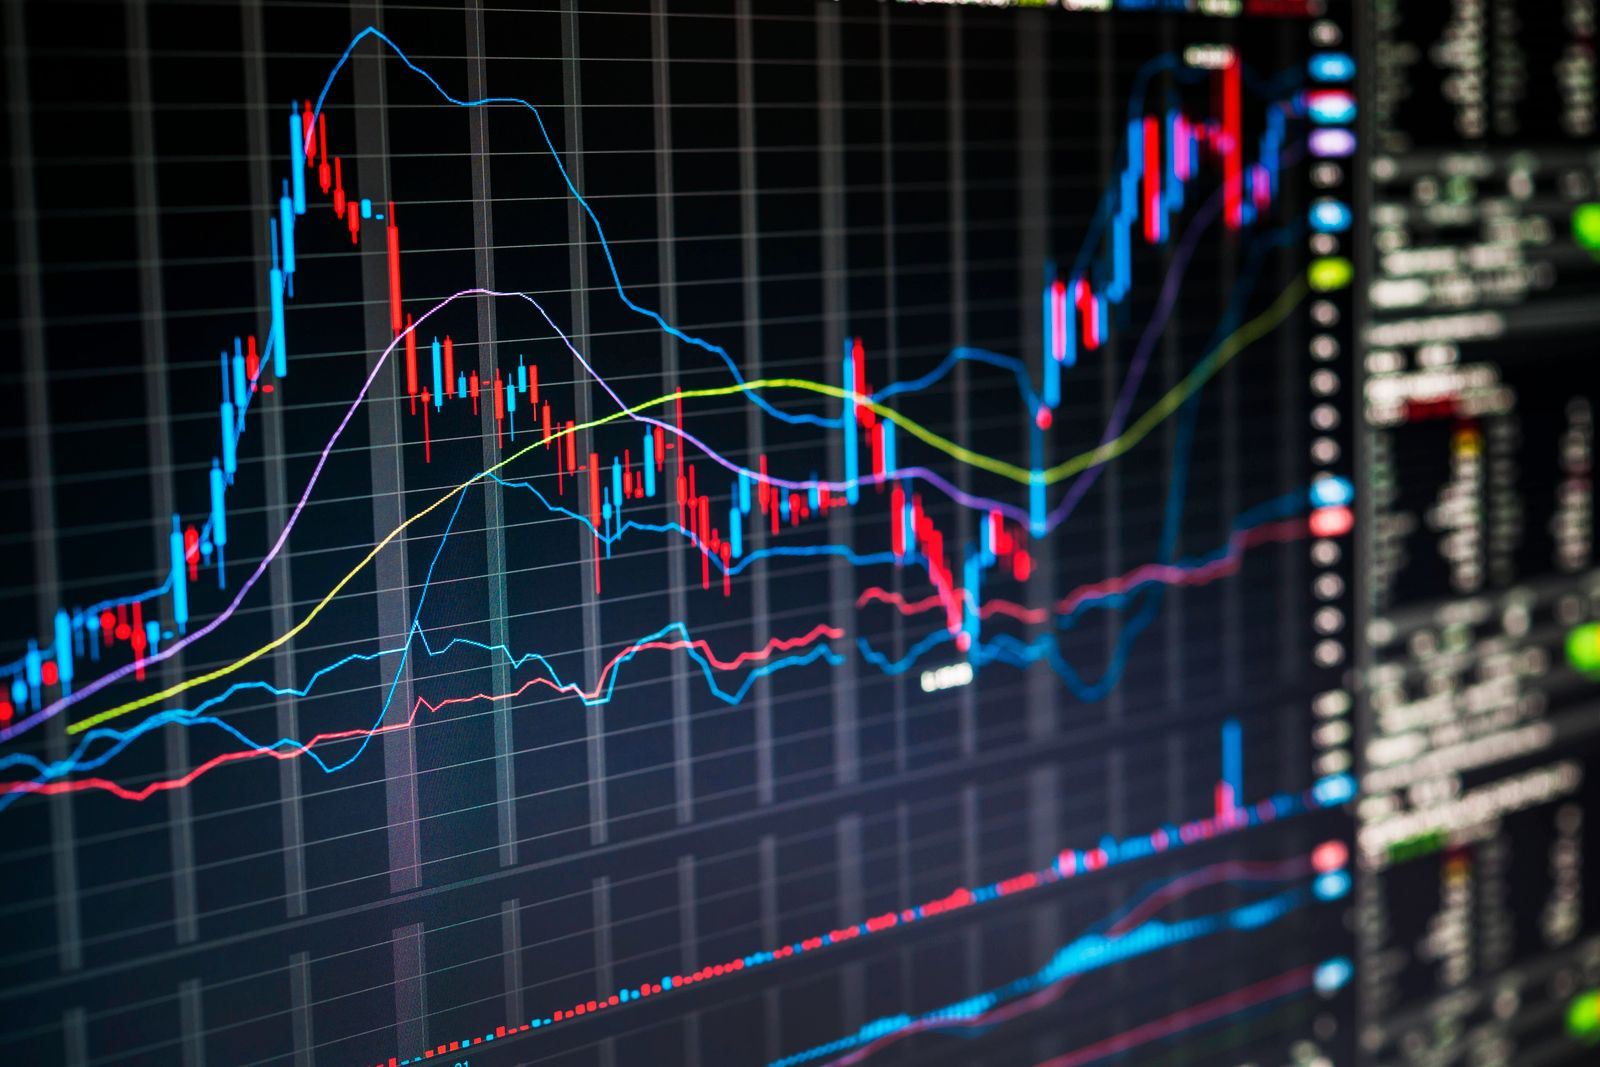 börse,aktienkurs,börsenhandel *** stock exchange,stock price,stock exchange jqv-i7y